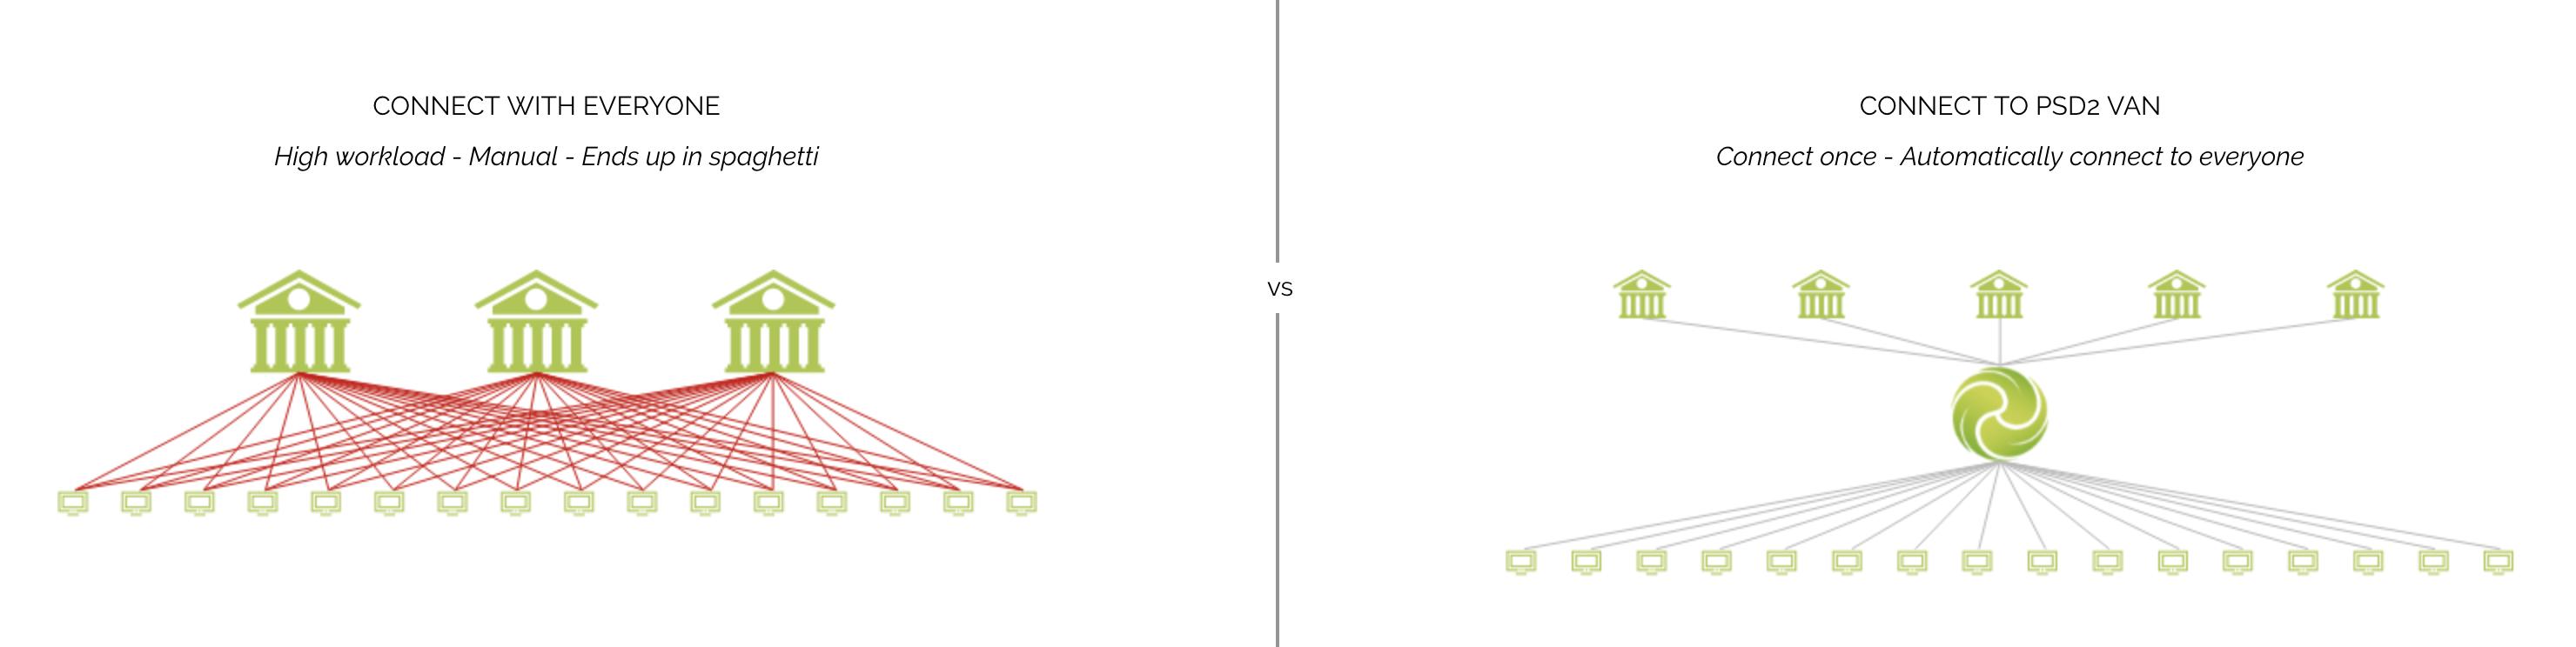 Entiros-PSD2-VAN-comparison